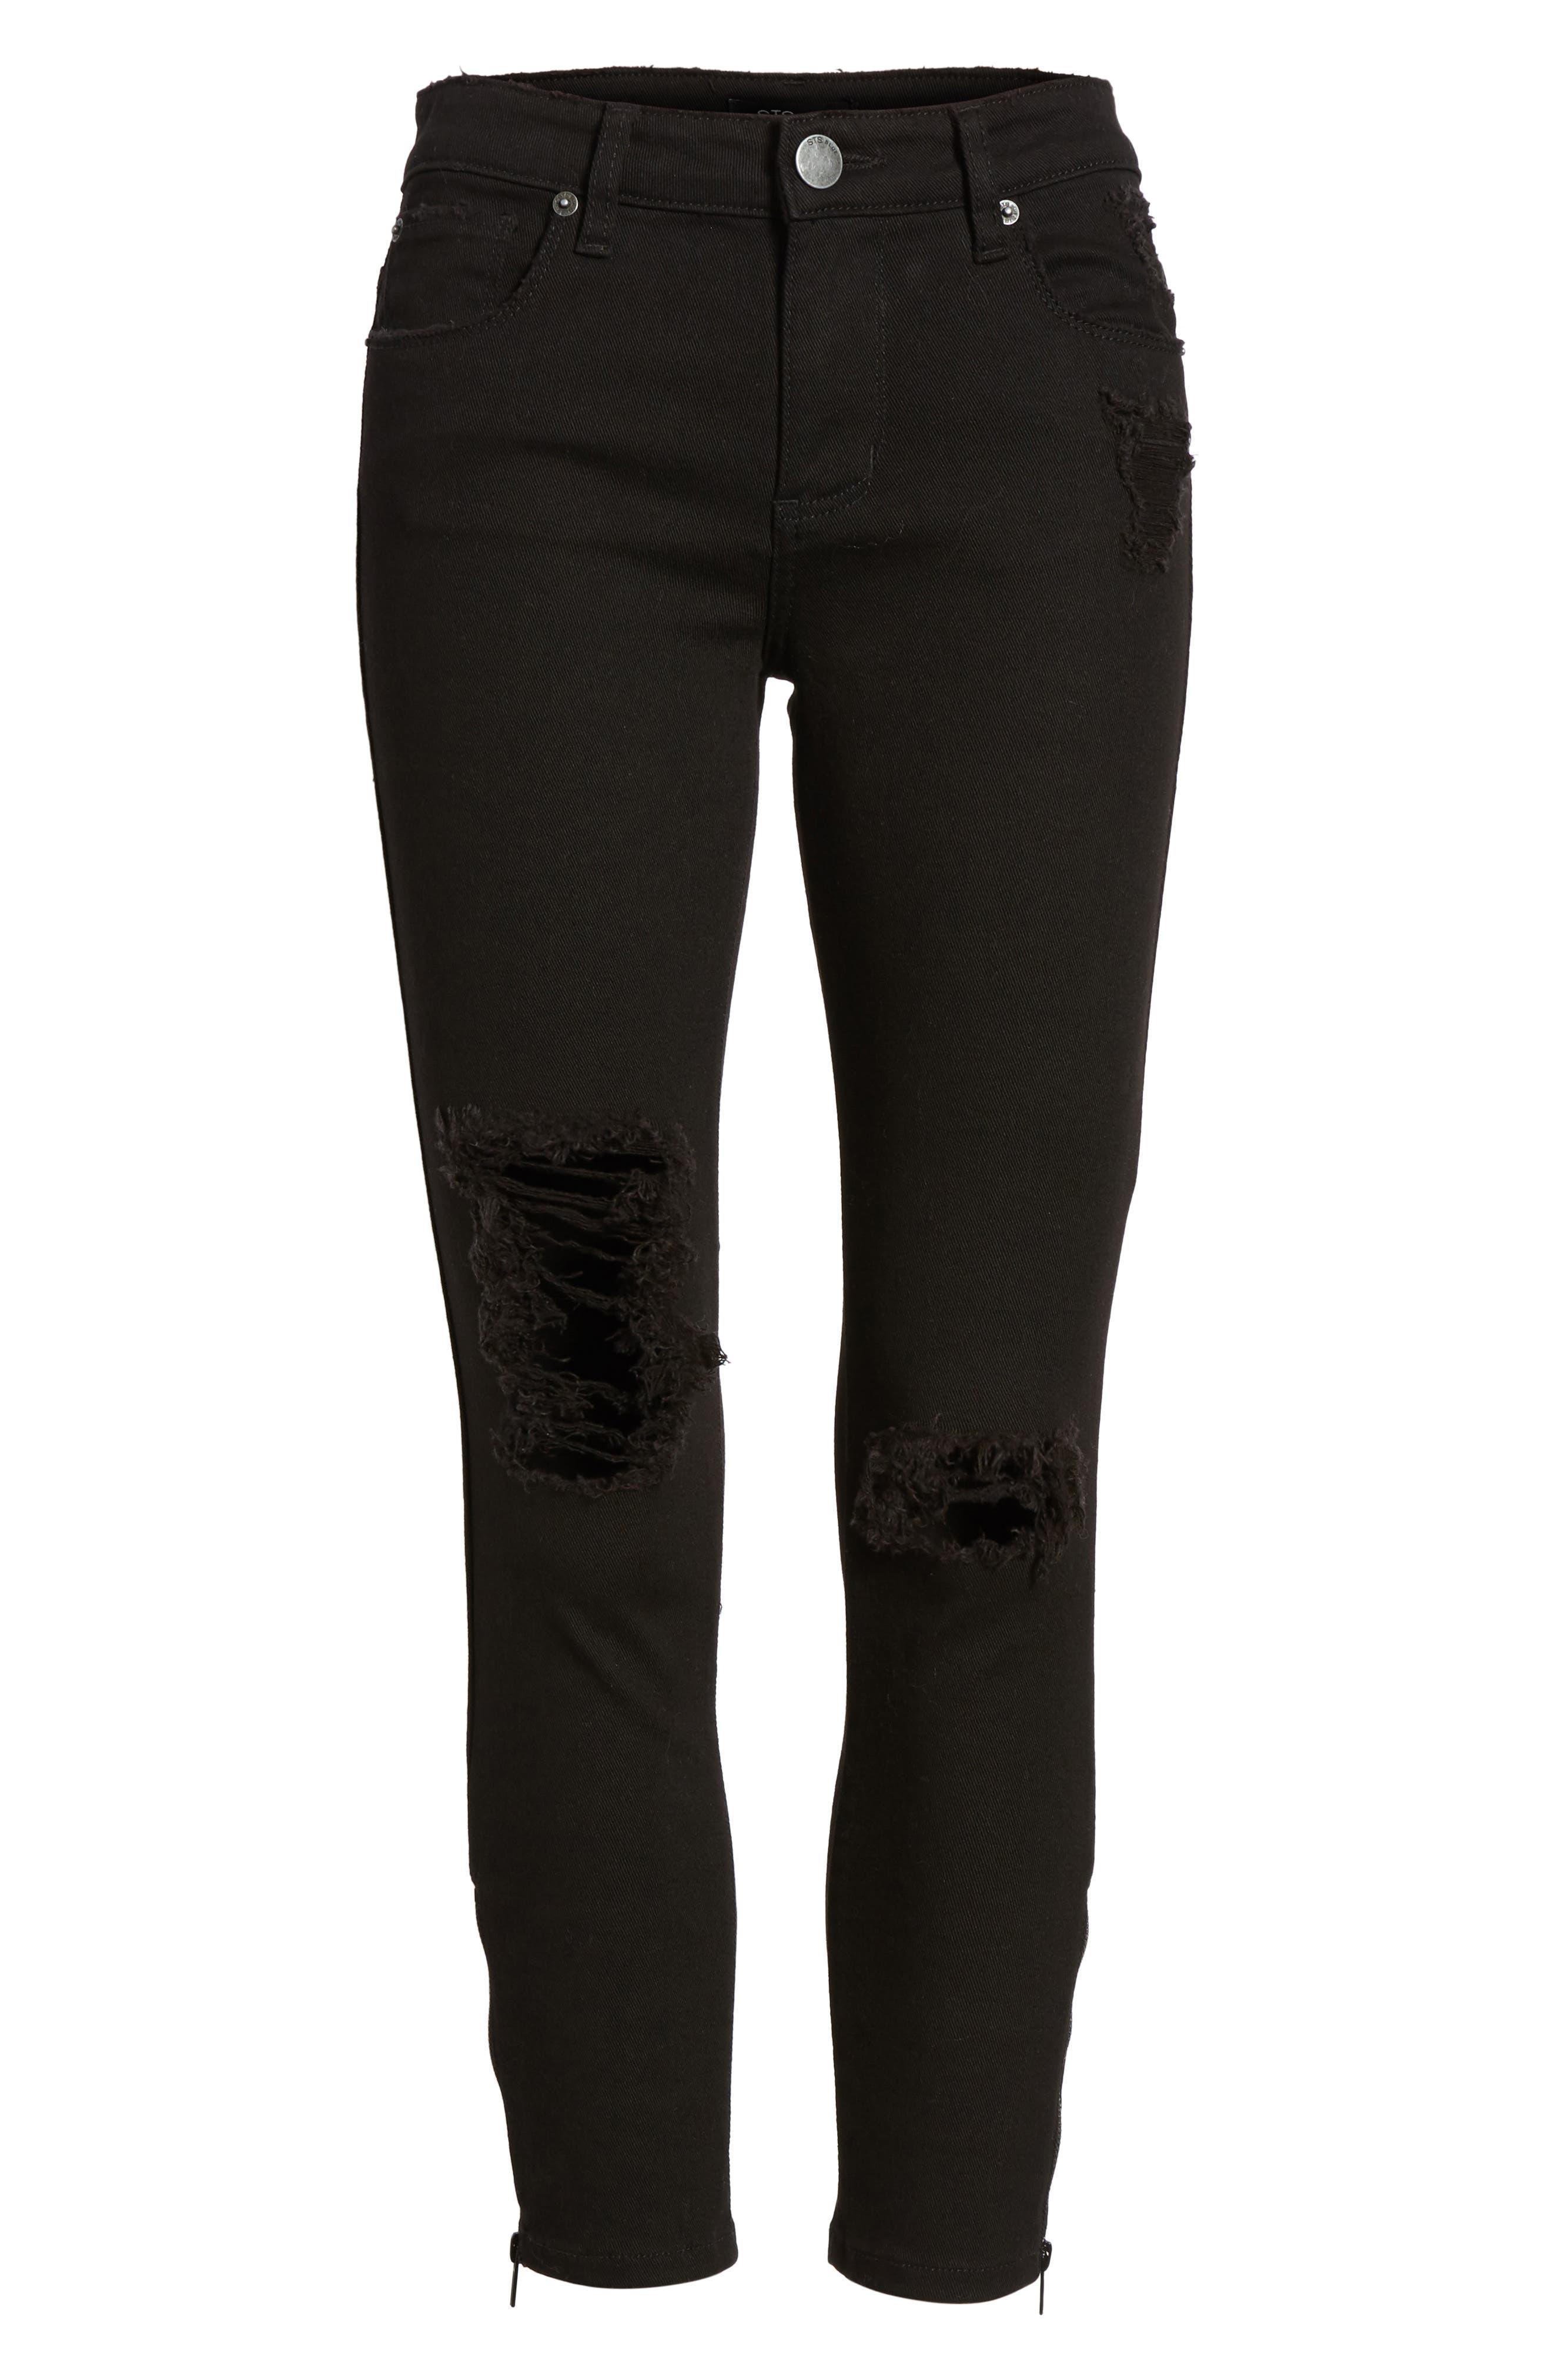 Emma Side Zip Skinny Jeans,                             Alternate thumbnail 6, color,                             Black